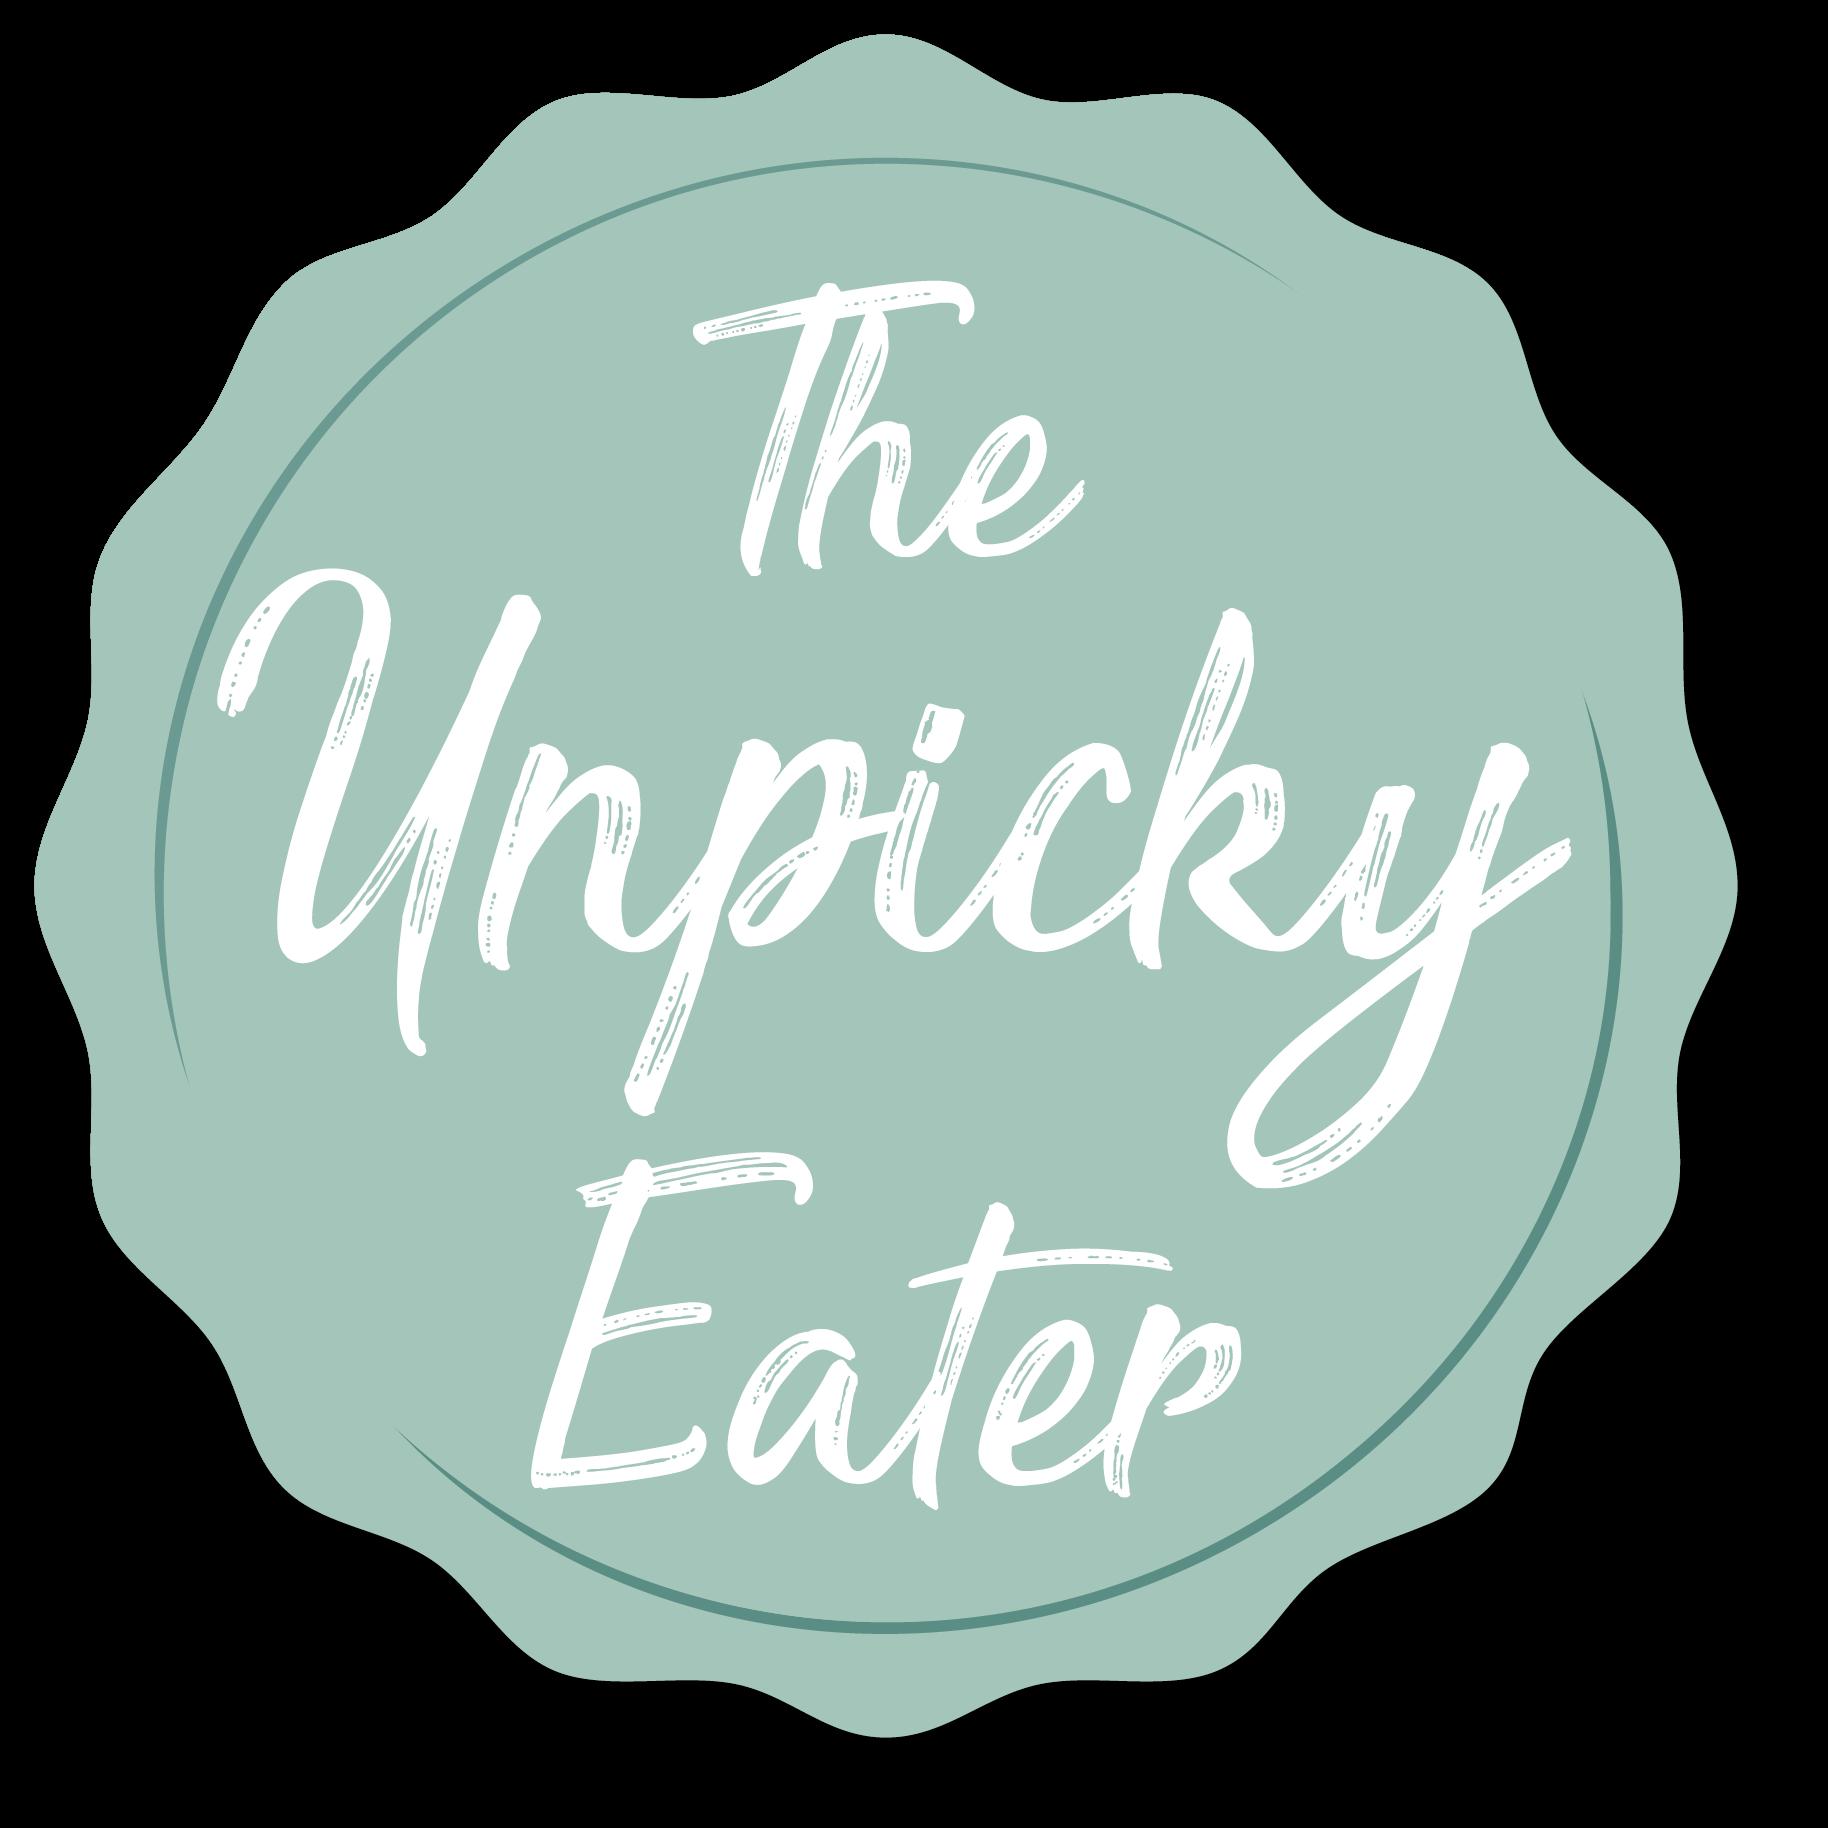 The Unpicky Eater logo